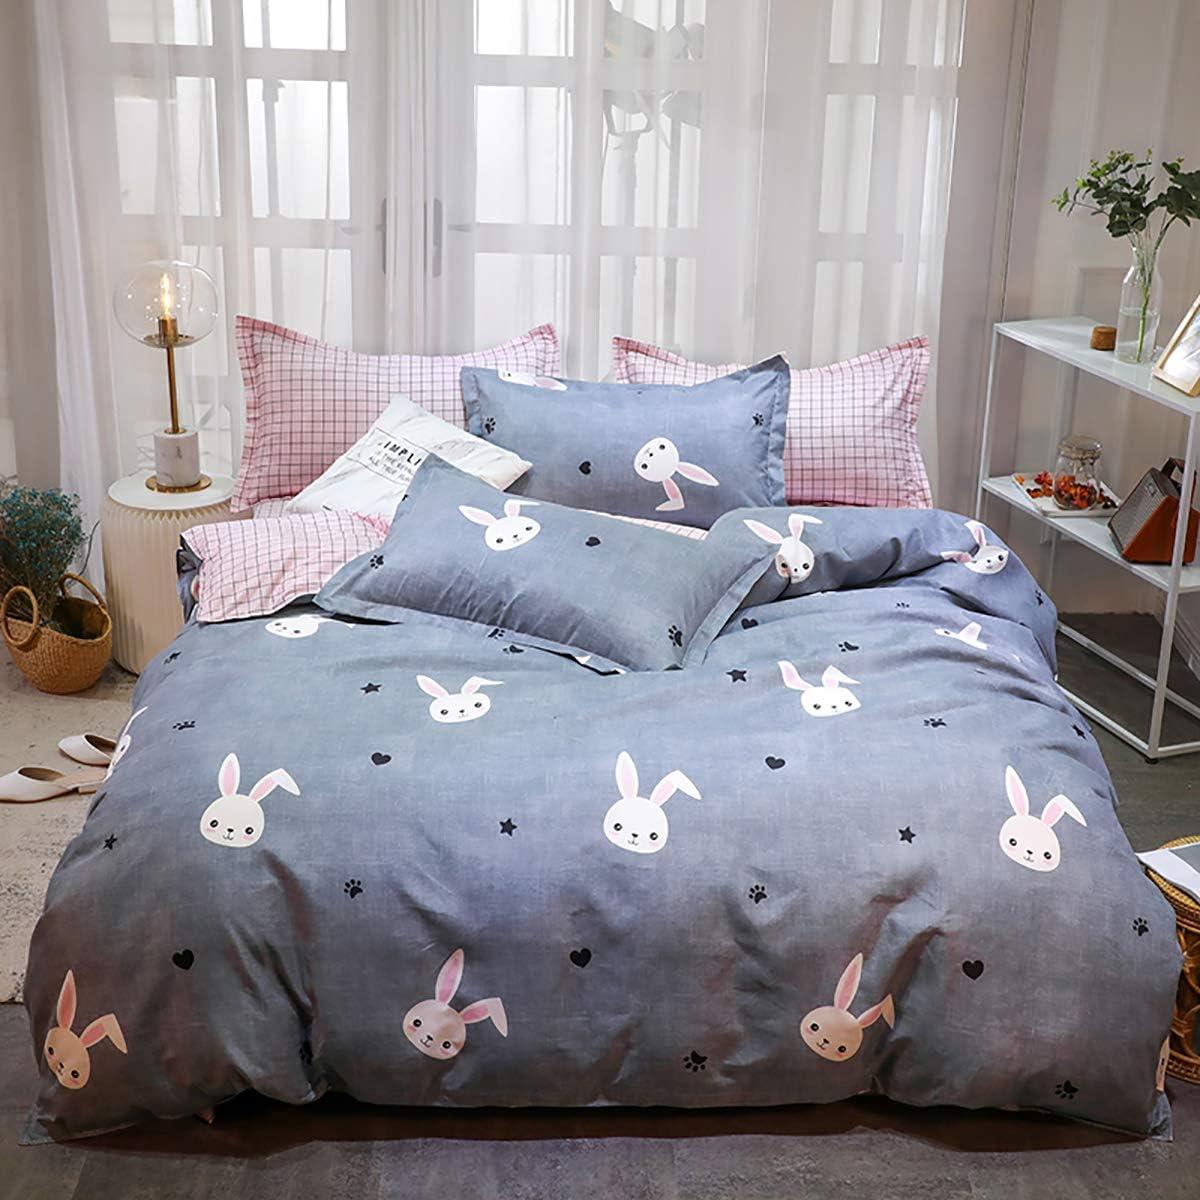 Omelas Kids Grey Bedding Rabbit Star Duvet Cover Twin Set Girls Pink Gingham Plaid Reversible Printed Bedding Soft Microfiber Quilt Comforter Cover,Zipper Closure,2 Pillow Shams (QQT,T)